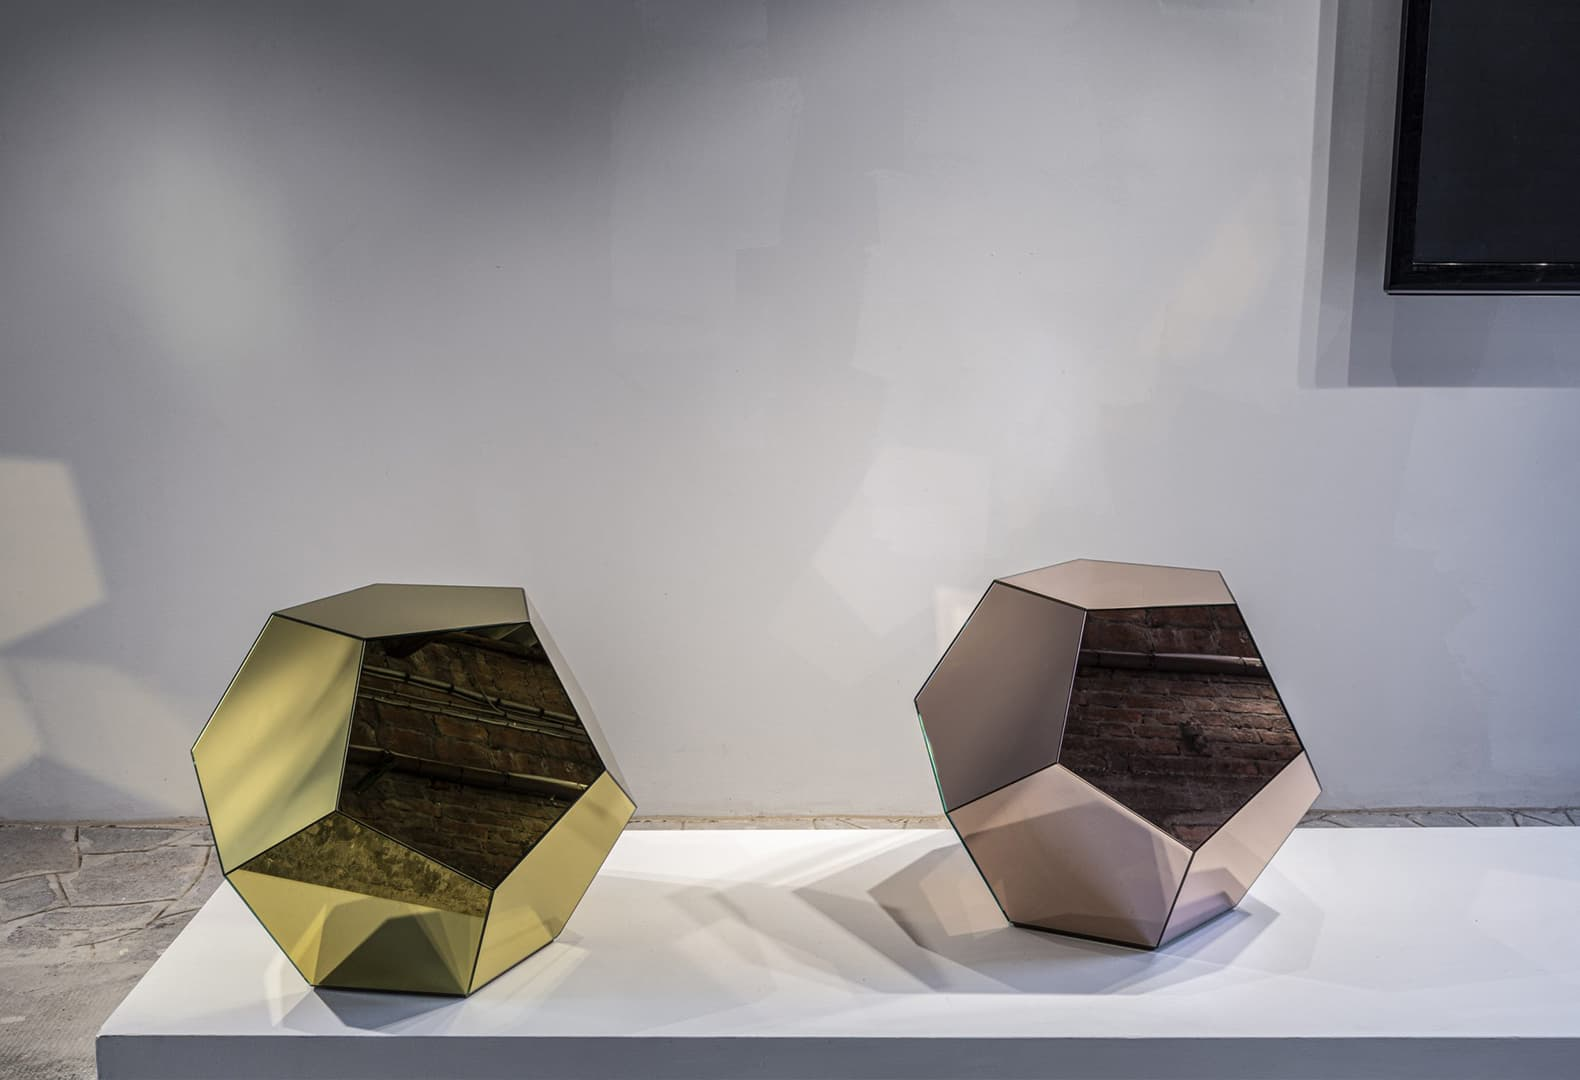 Mars Polyhedron, Krista Kim